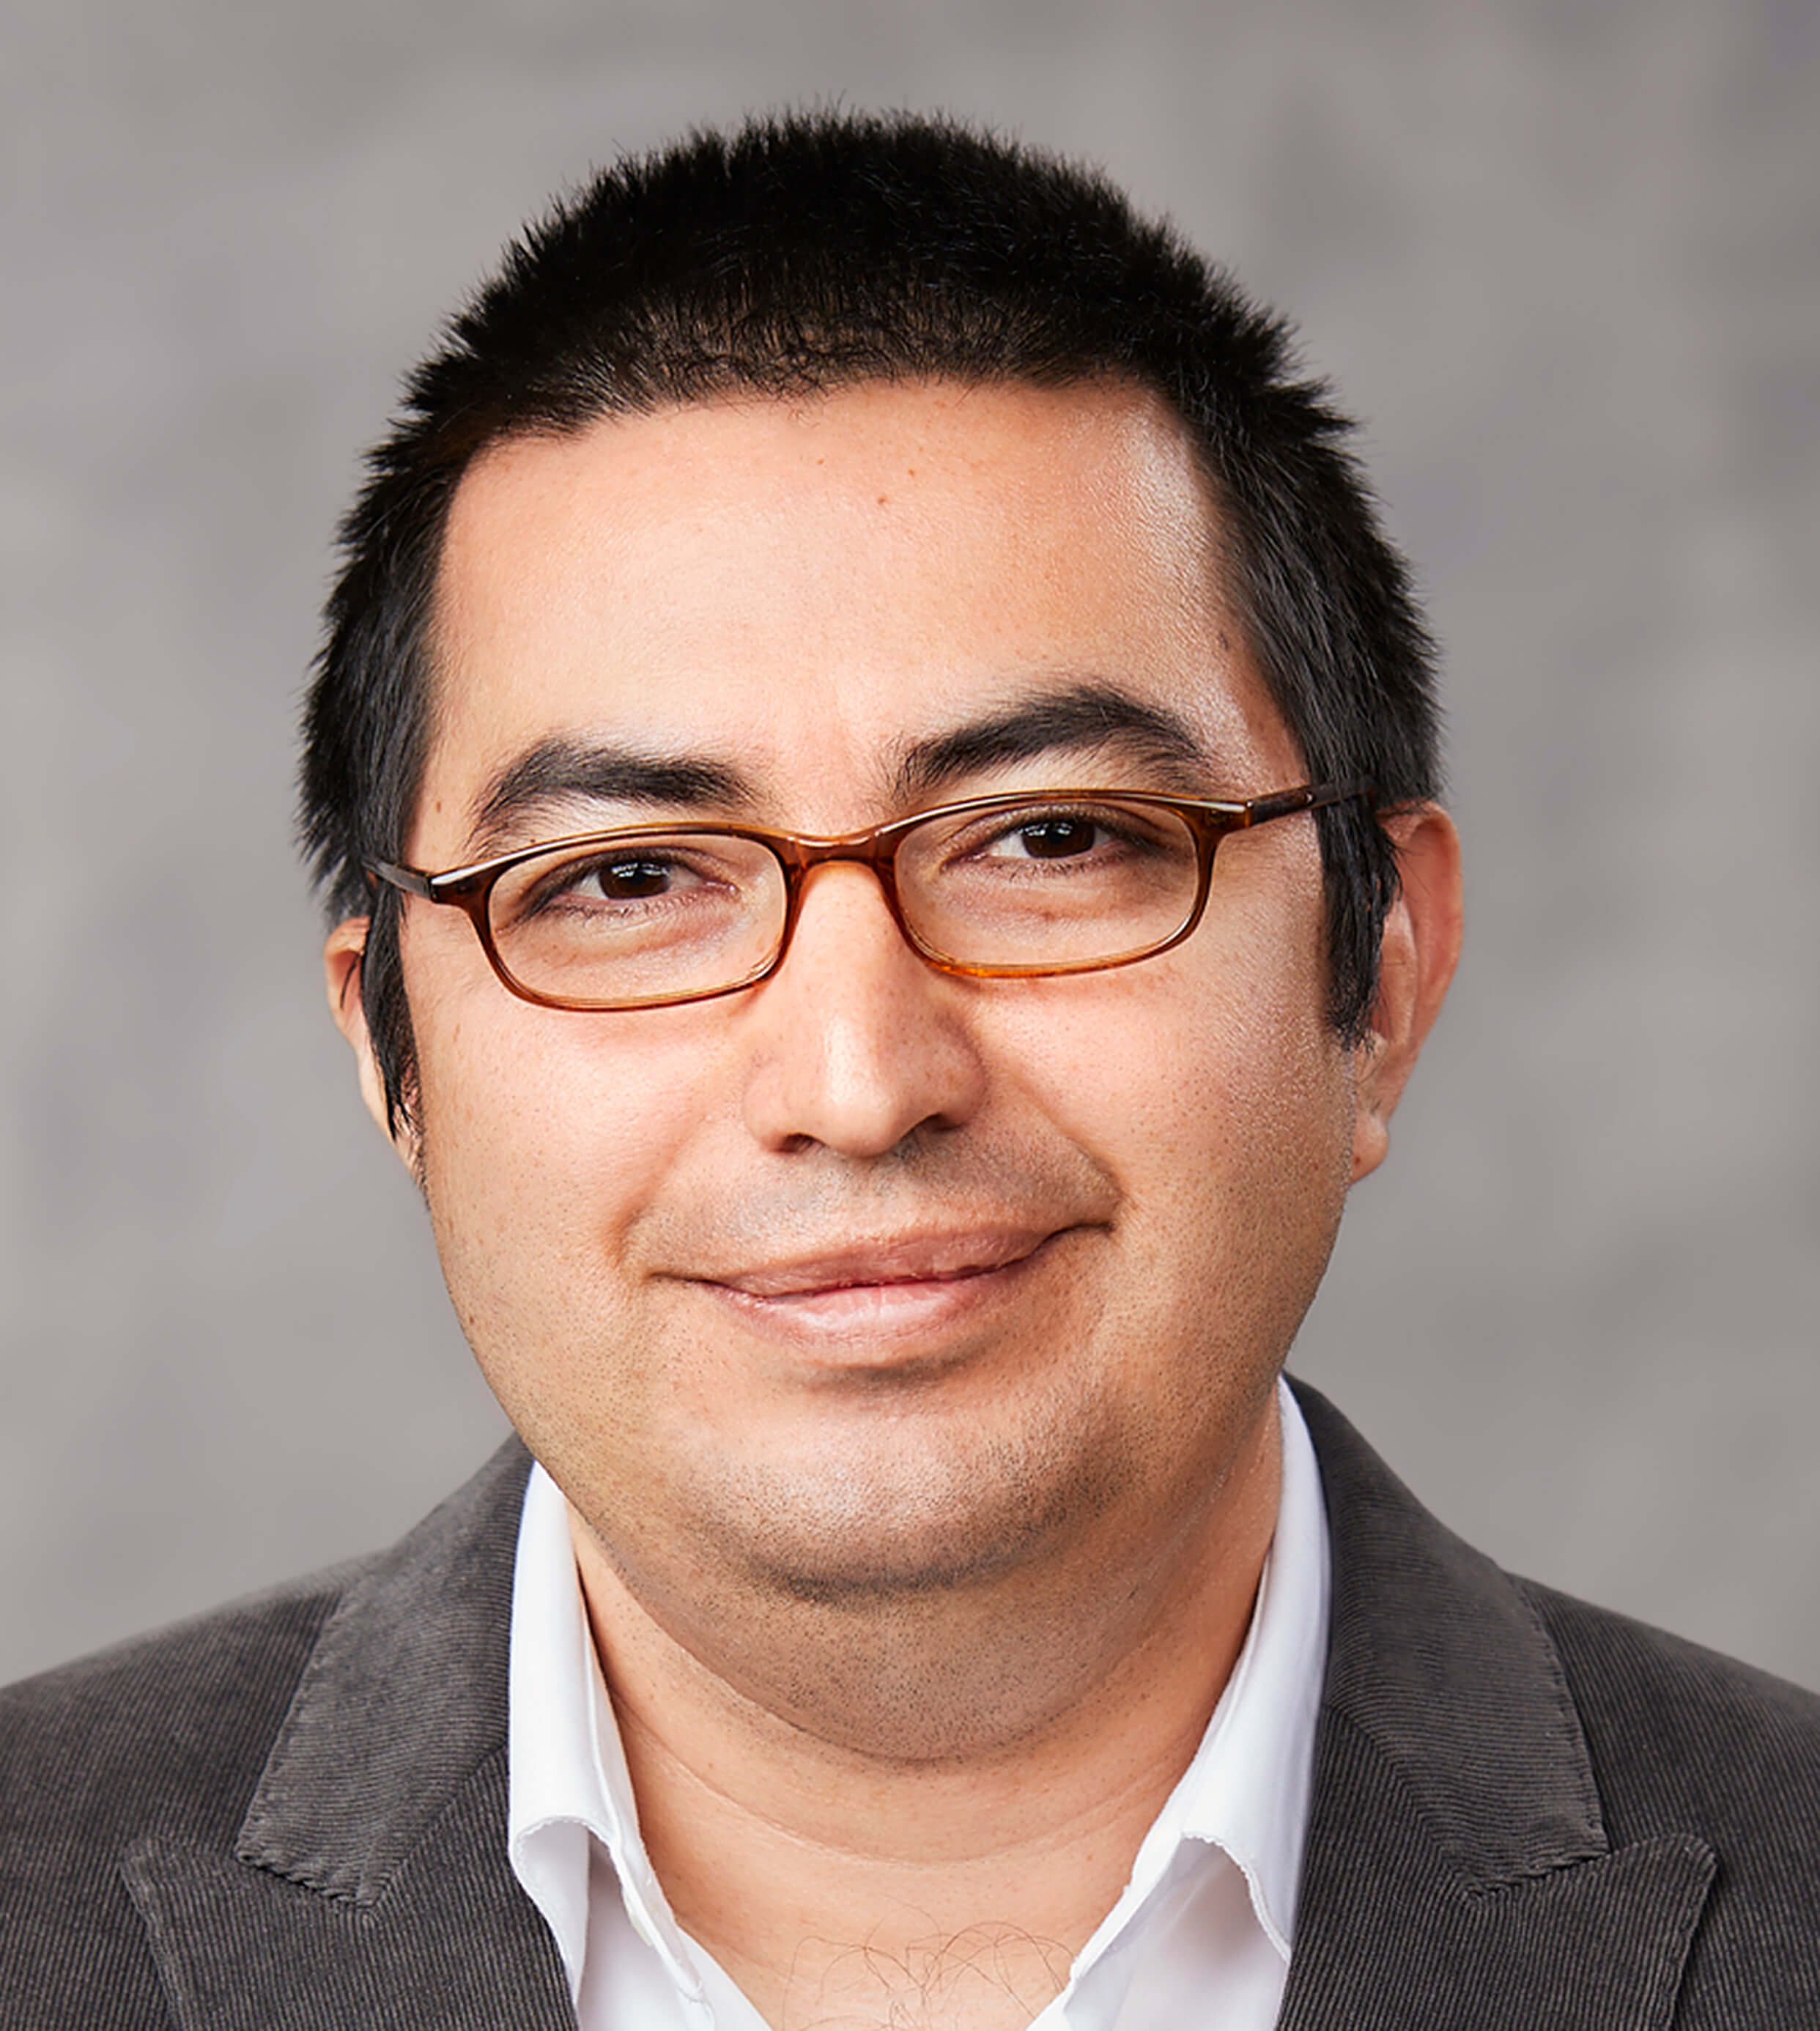 Eduardo Reategui, PhD (Lead)